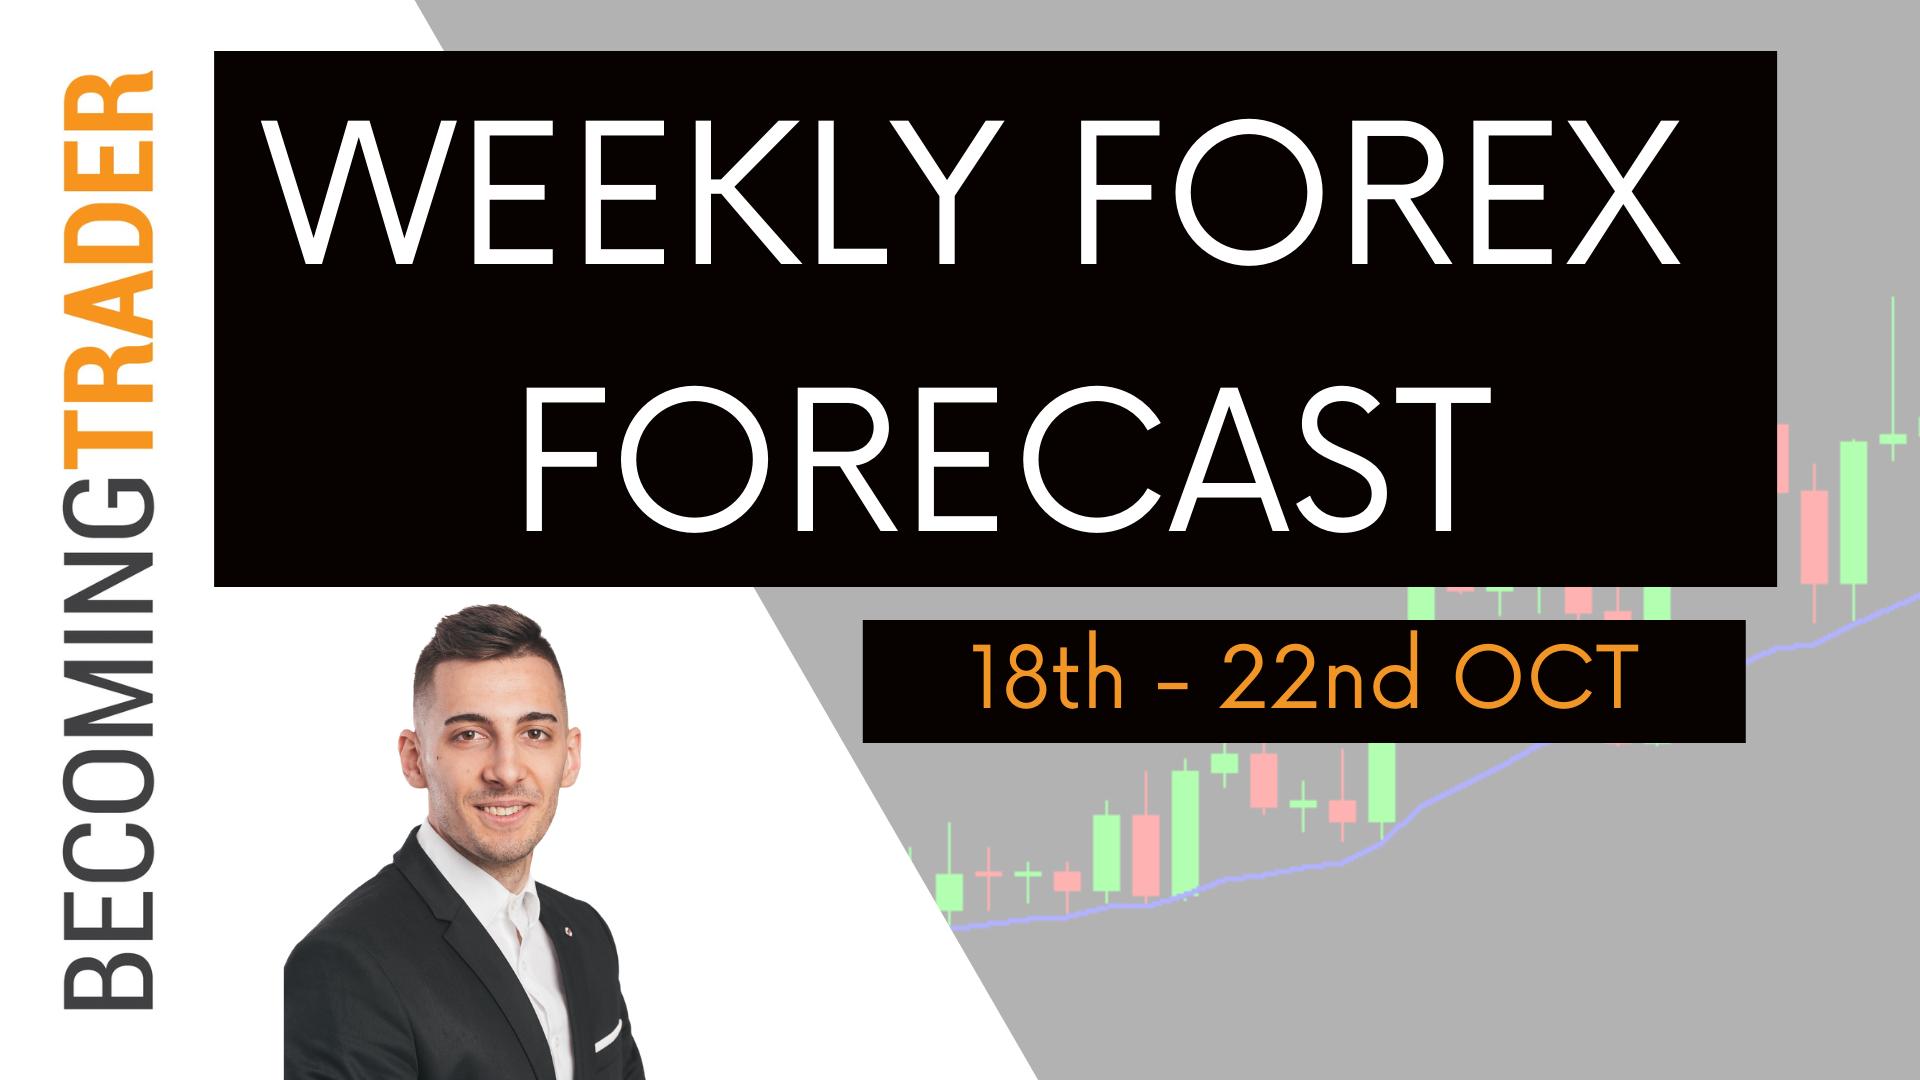 Weekly Forex Forecast 18th to 22nd Oct 2021 | EURUSD , GBPUSD , AUDUSD , NZDUSD , USDCAD , USDJPY